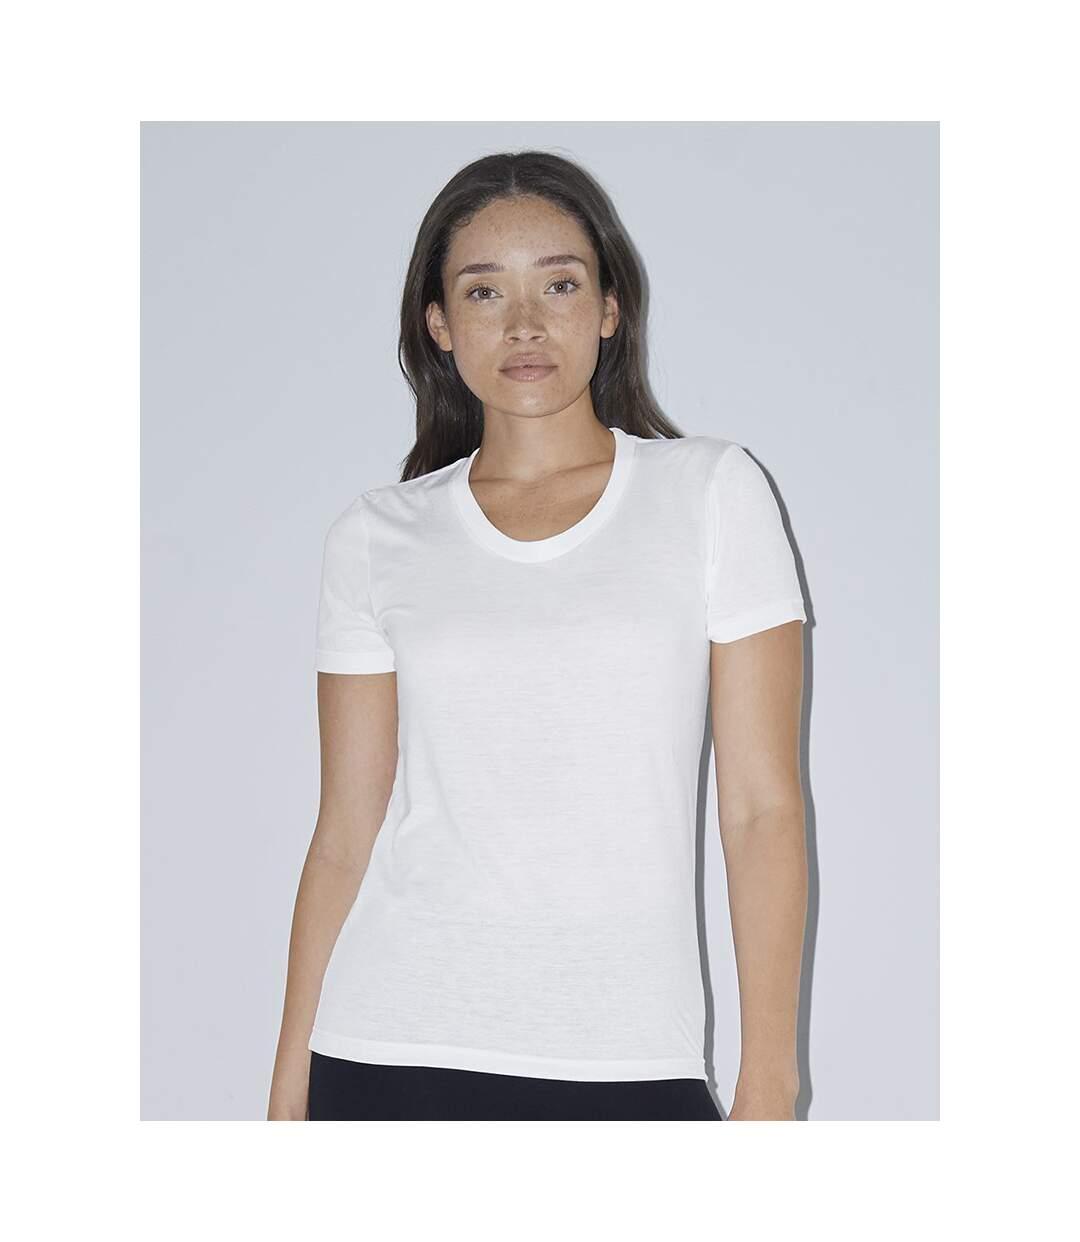 American Apparel - T-Shirt - Femme (Blanc) - UTBC4084